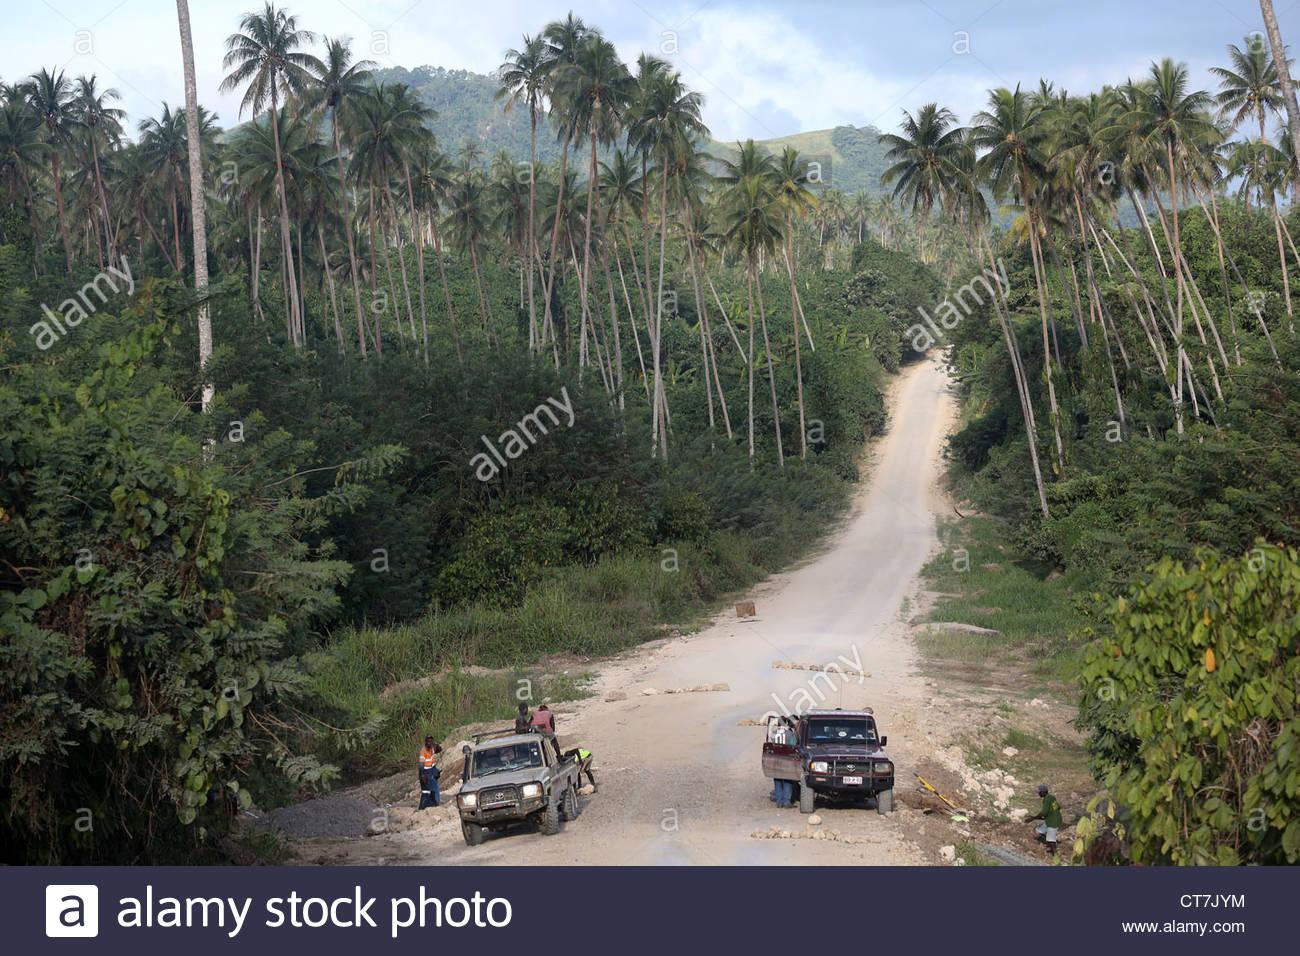 Road to Arawa, Bougainville island, Papua New Guinea Stock Photo.